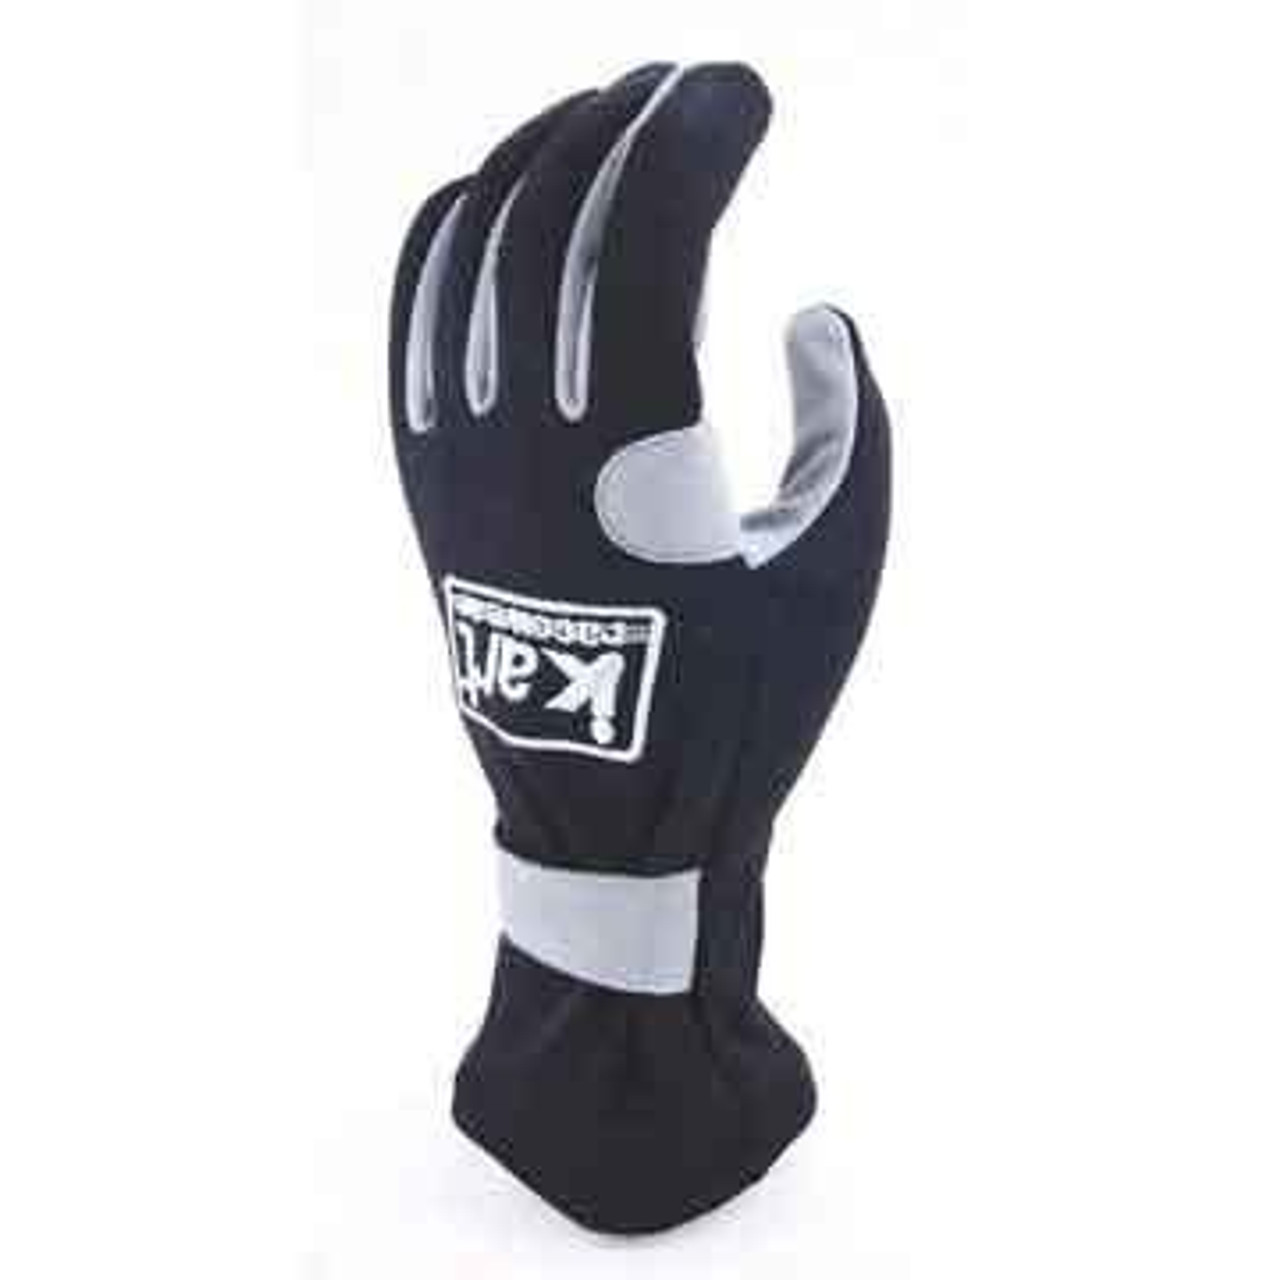 Kart Racewear 200 Series Youth Gloves